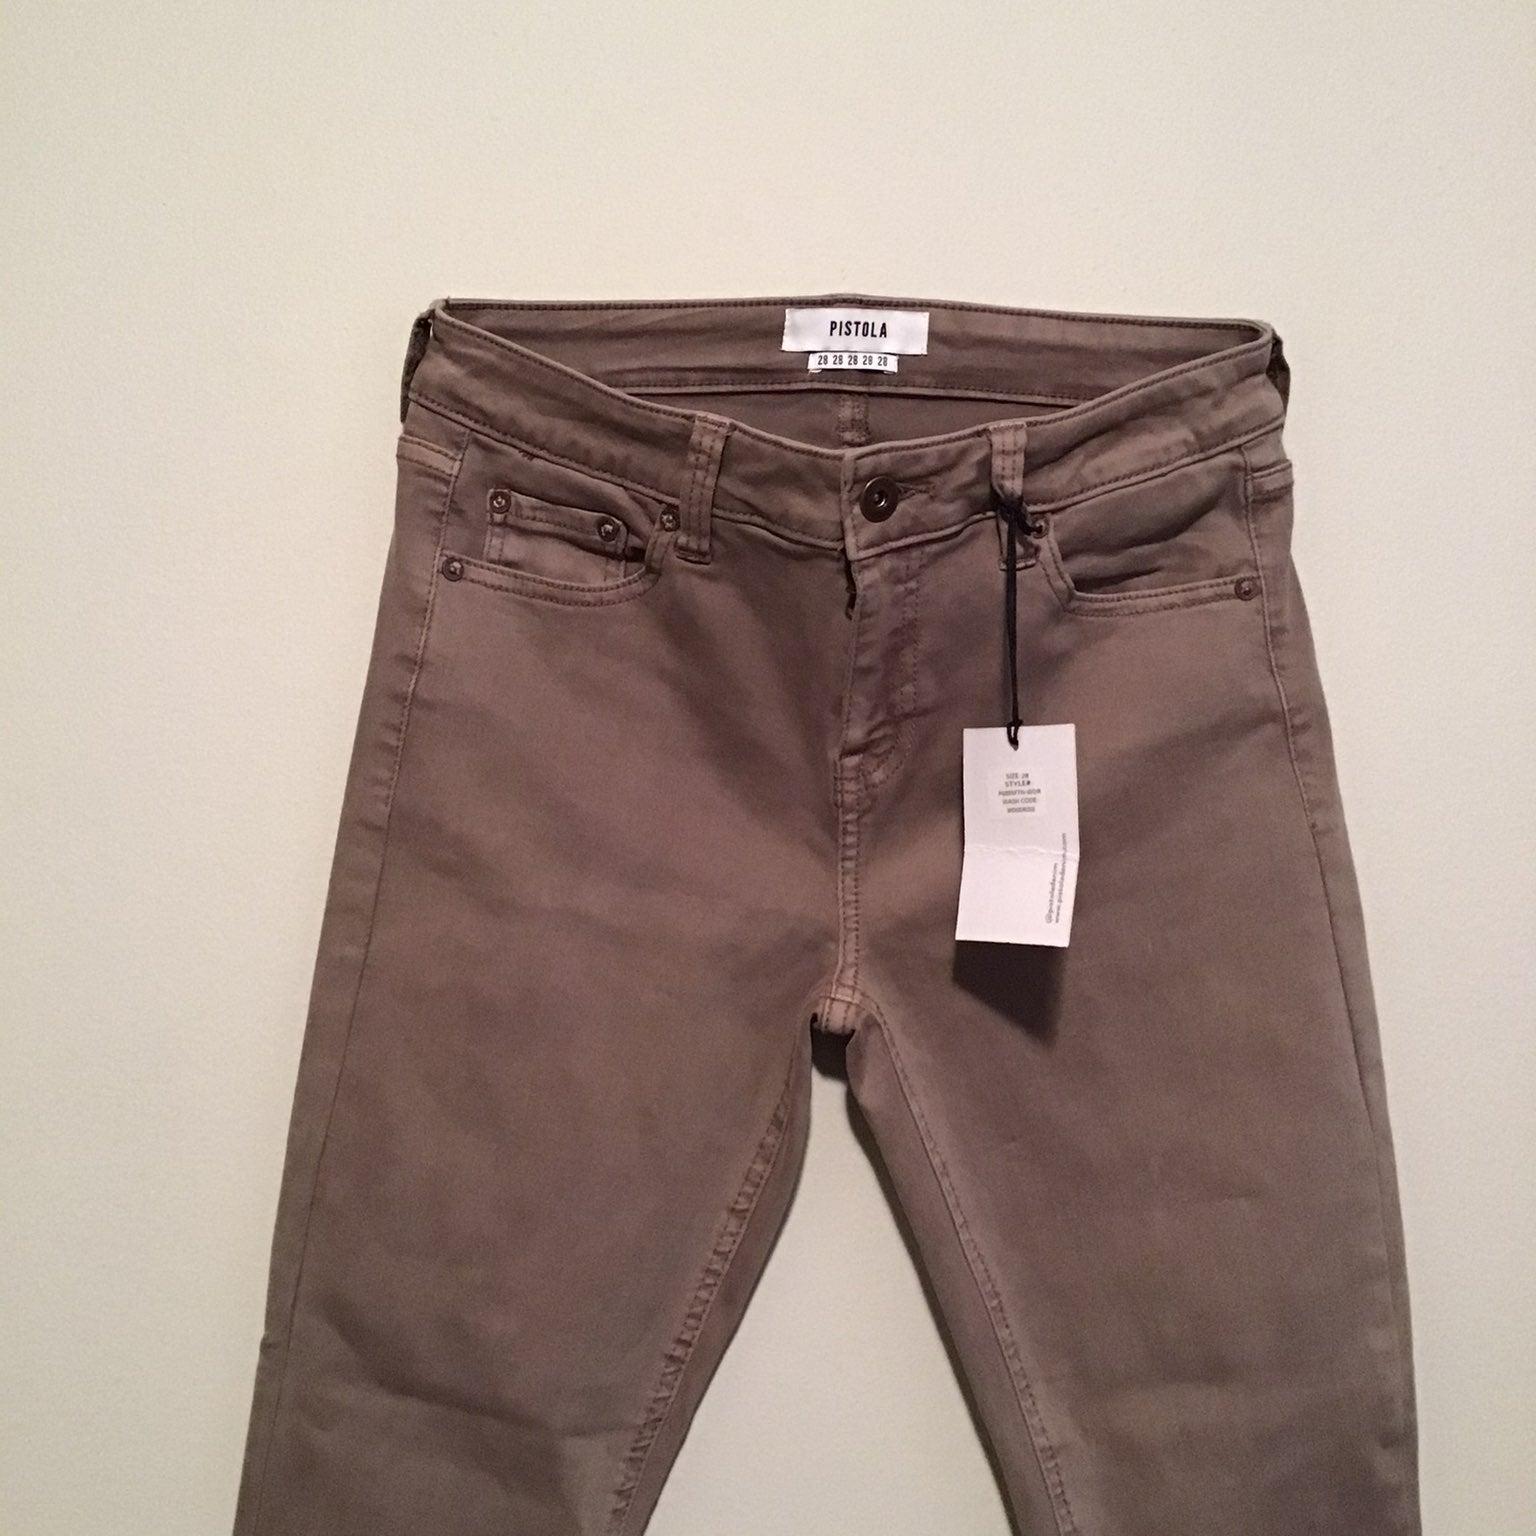 Ankle skinny zip jeans